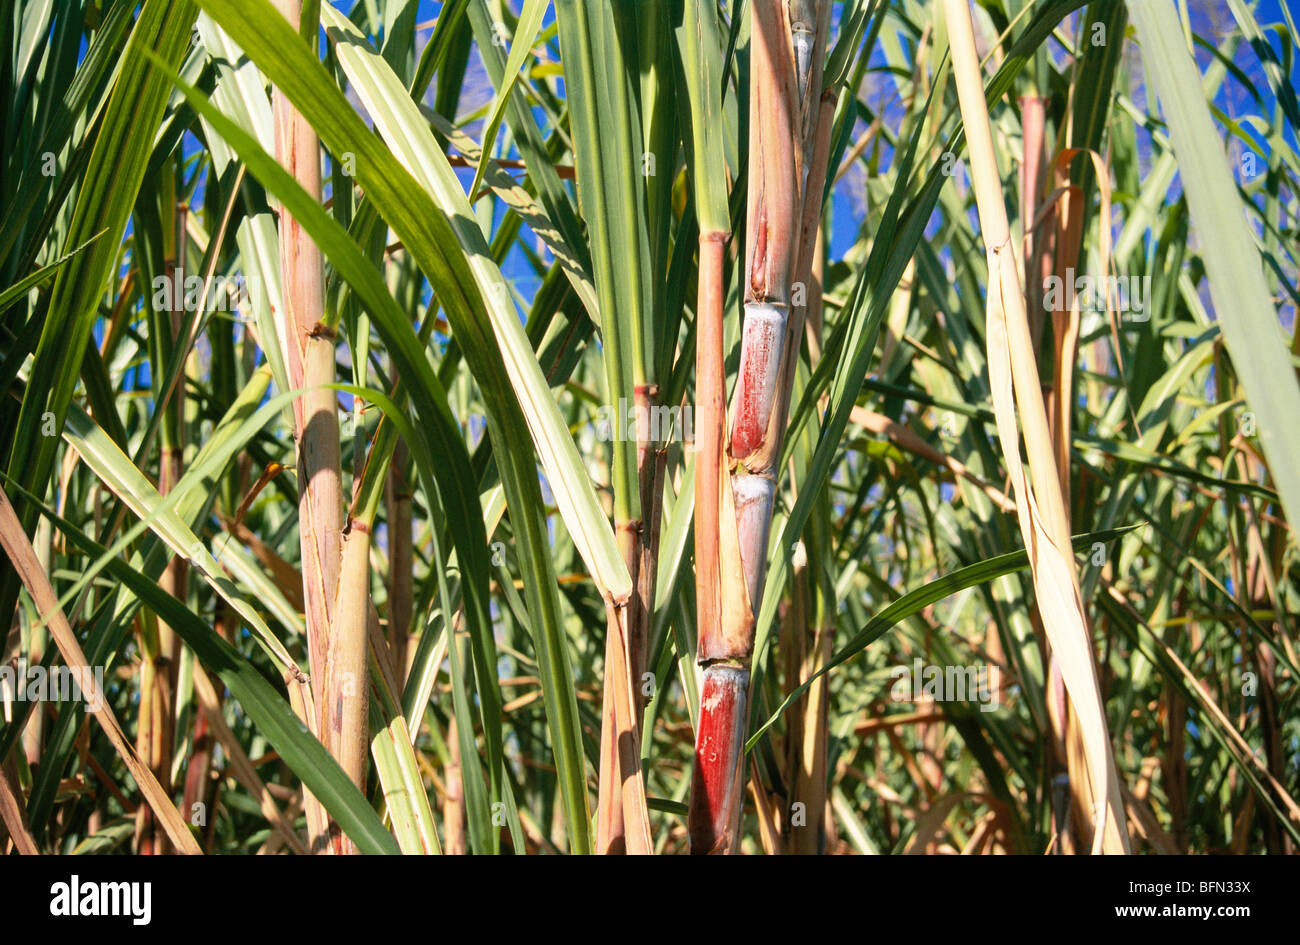 AGRI SEARCH (INDIA) PRIVATE LIMITED - Zauba Corp